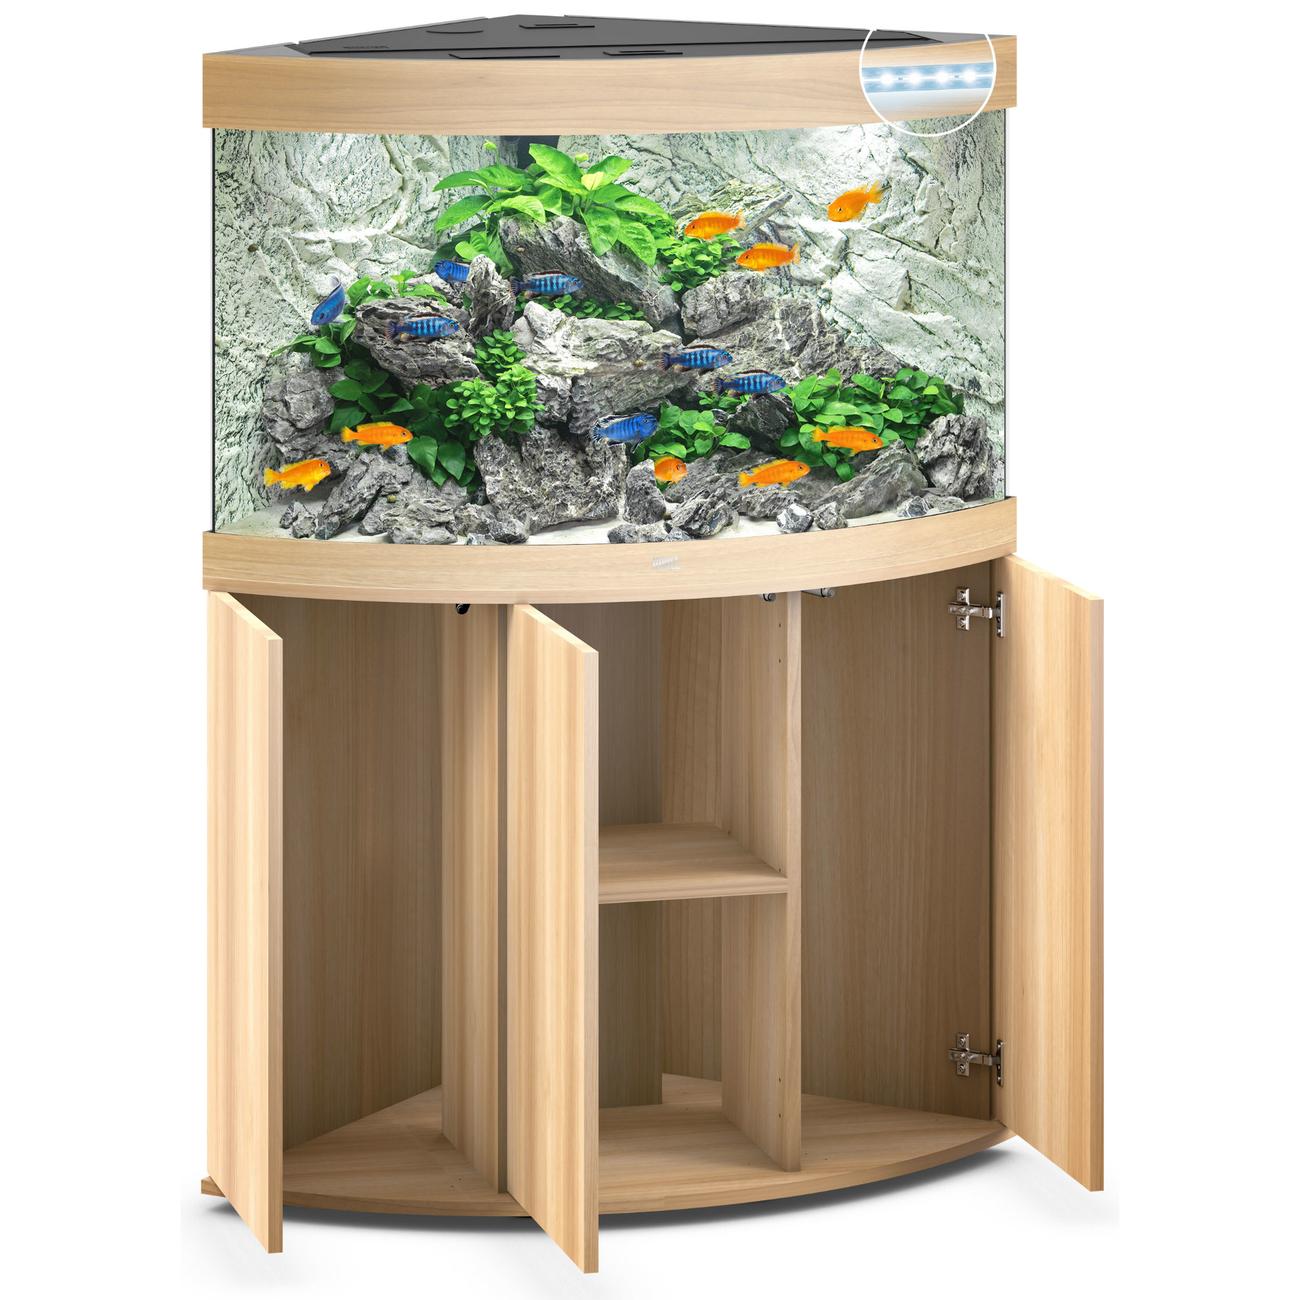 Juwel Trigon 190 LED Eck-Aquarium mit Unterschrank Bild 12